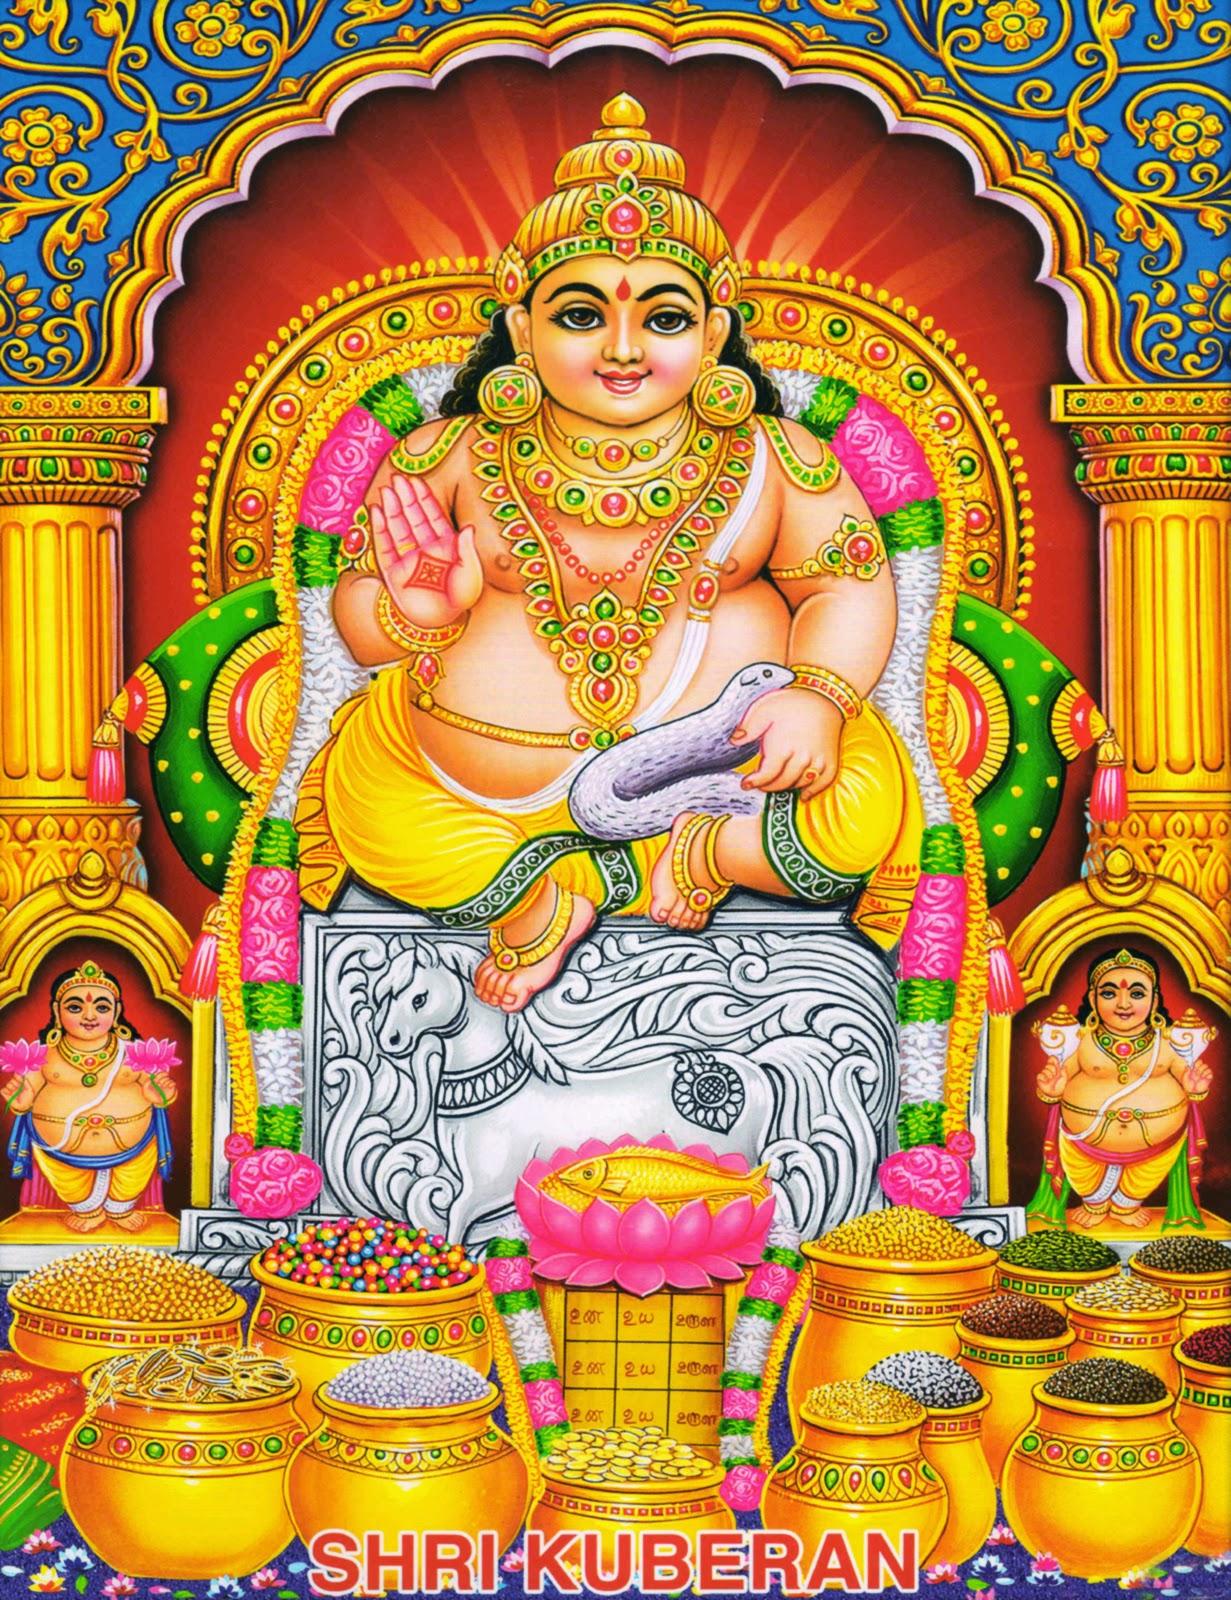 Gods Images Naveengfx